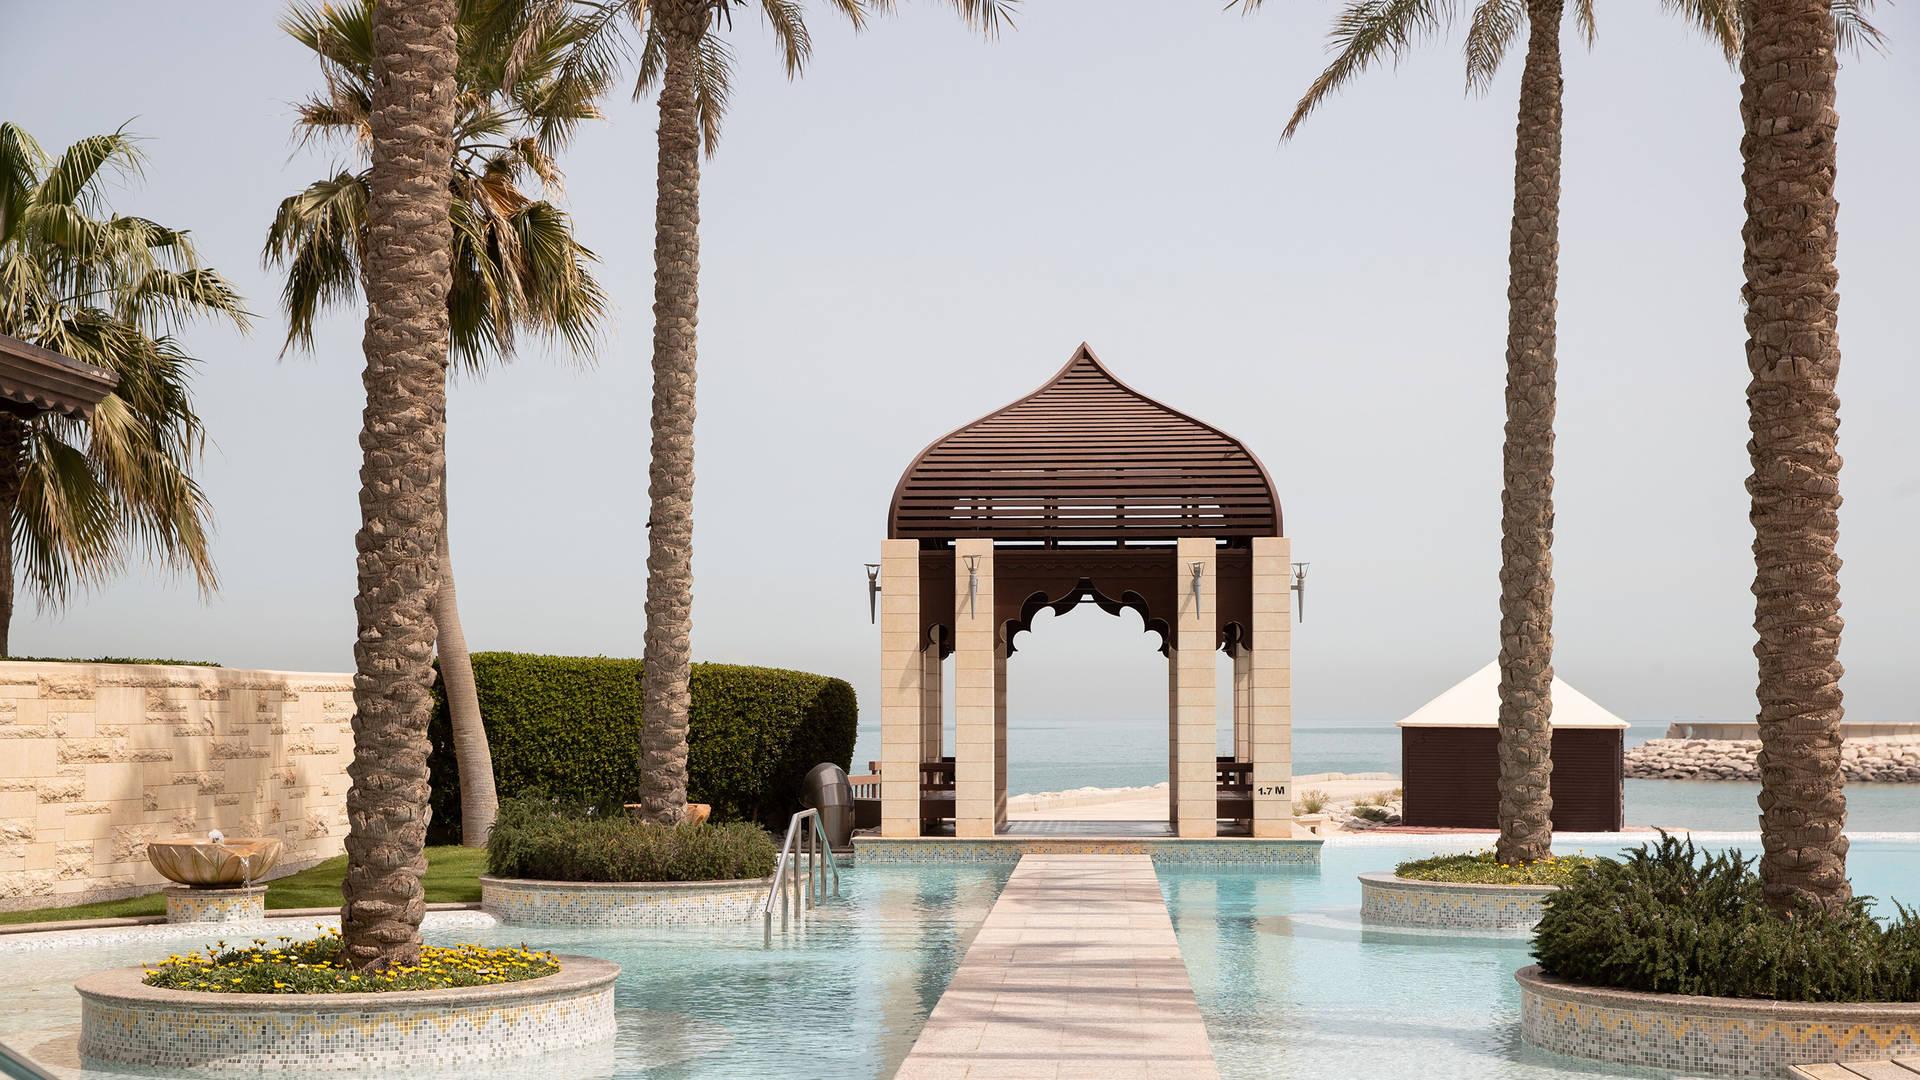 Infinity pool at Jumeirah Messilah